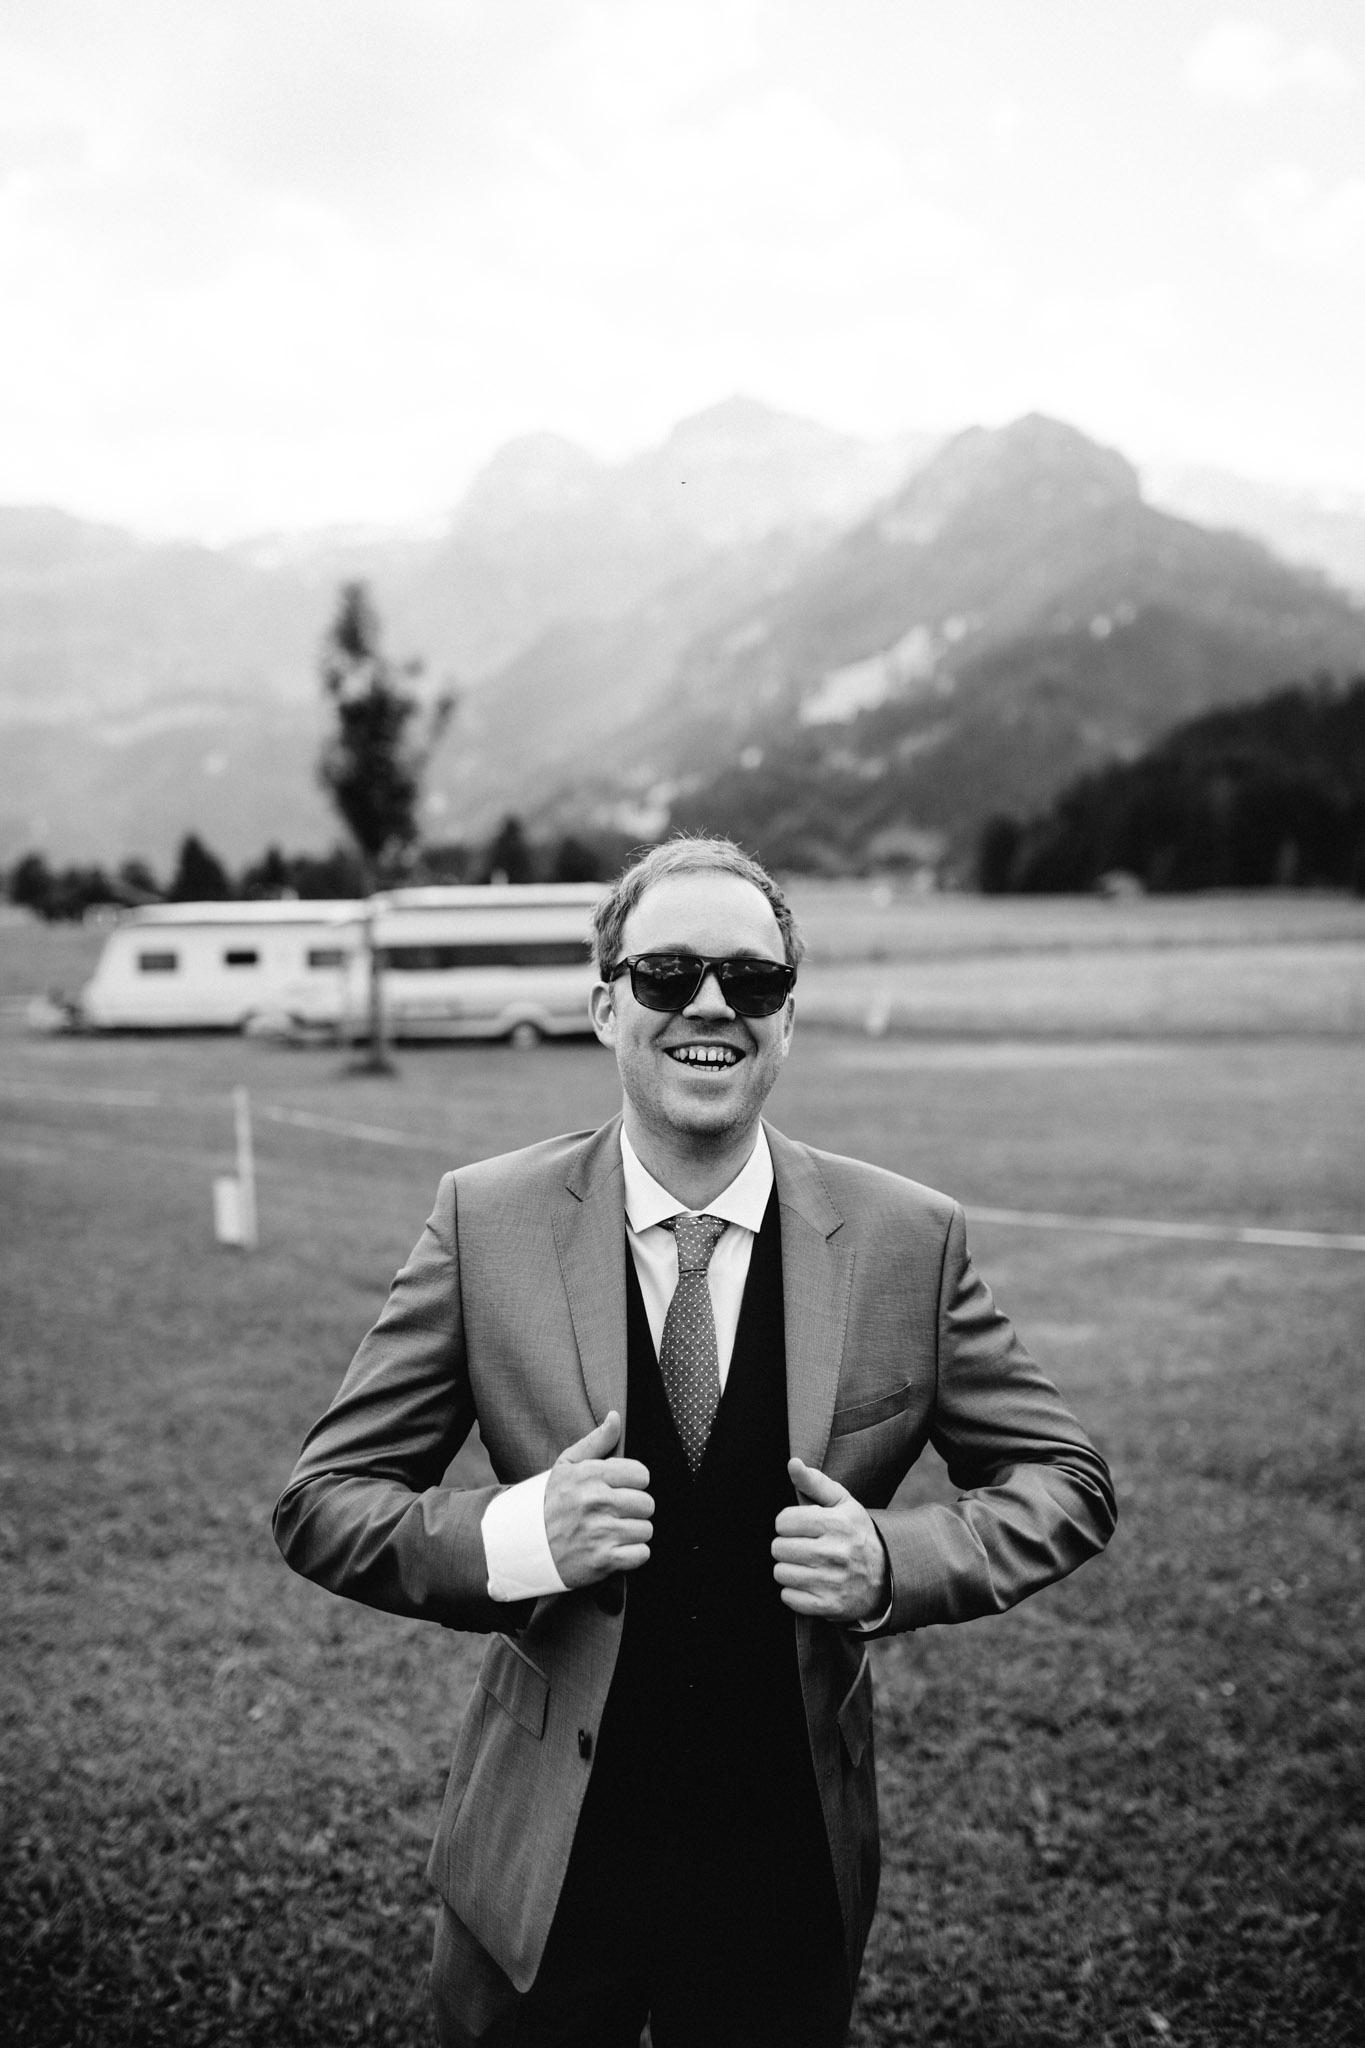 Lenl-Simmental-Buehlerhof-Pia-Anna-Christian-Wedding-Photography-EK-31.jpg